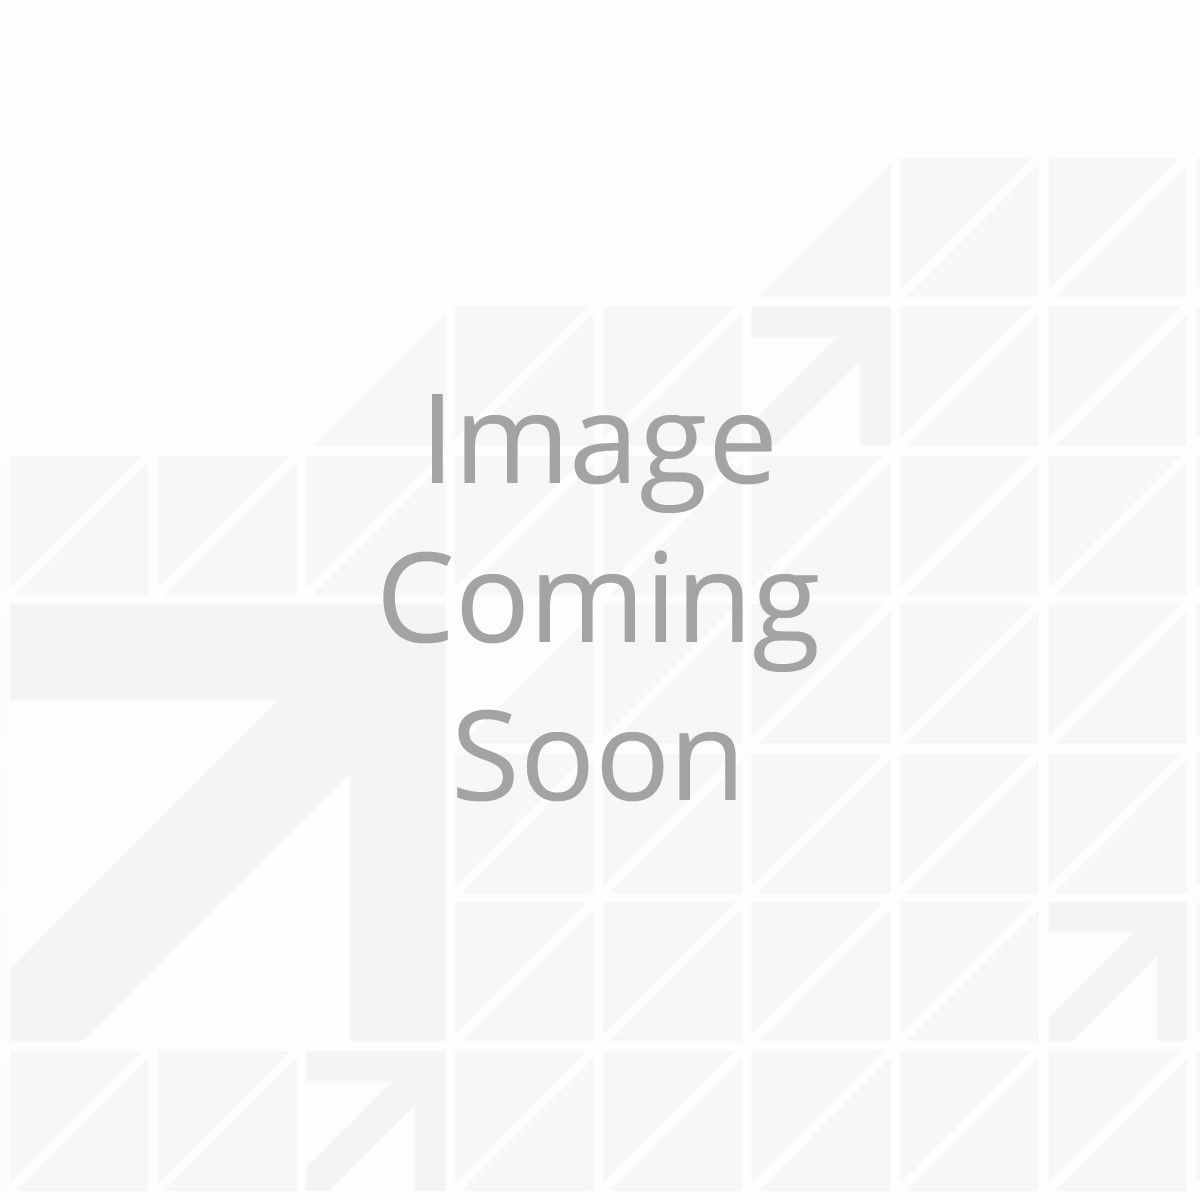 16' Orange Cargo Straps with J-Hooks (1,100 lbs., 2-Pack)